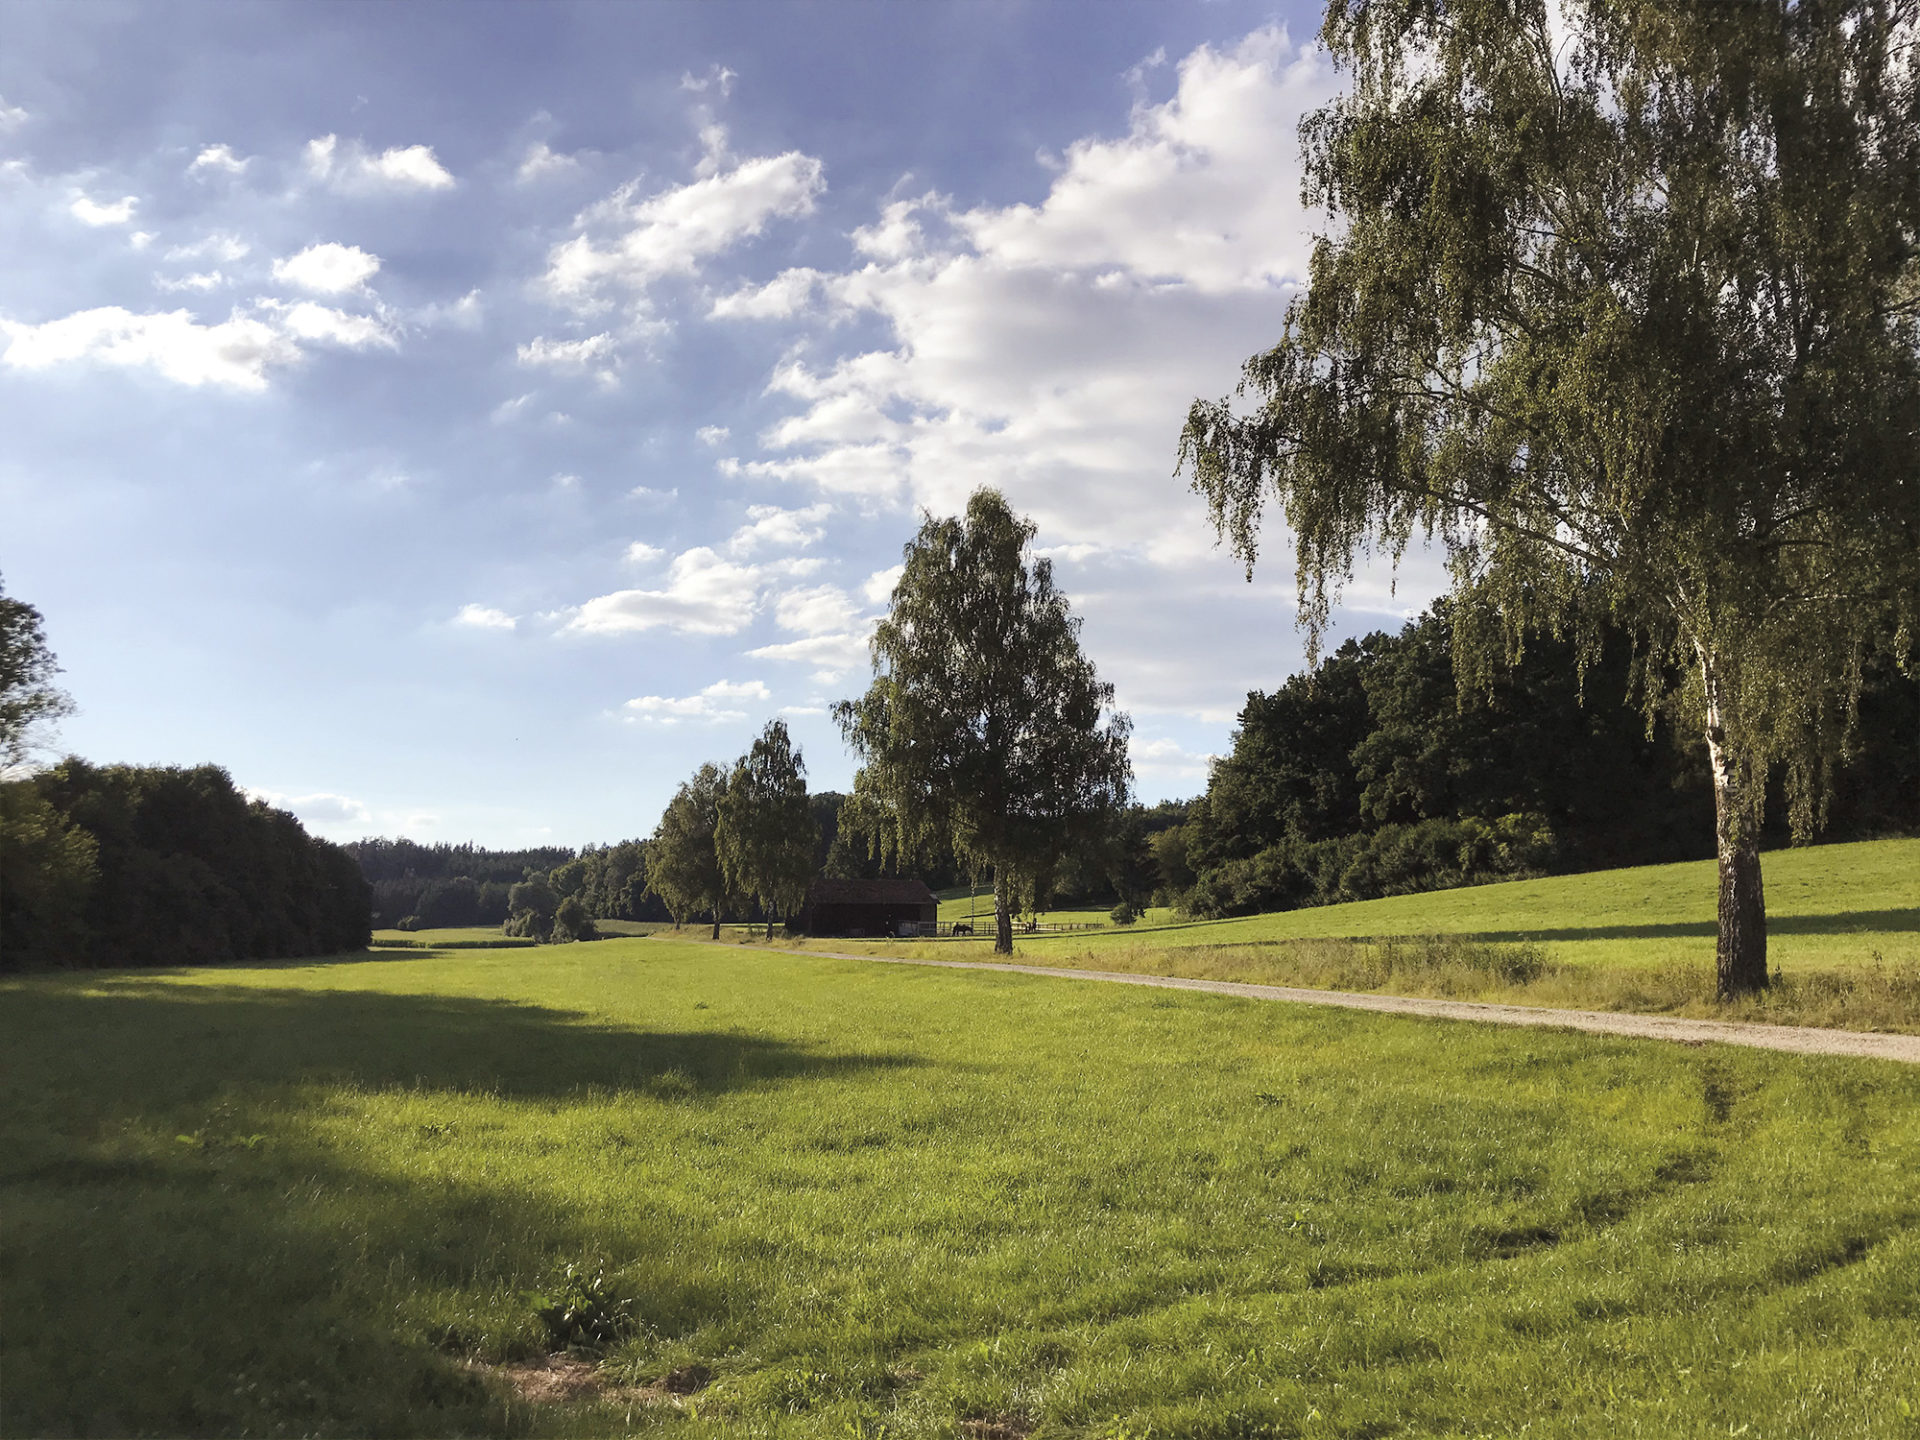 Klingenbach in Biberbach